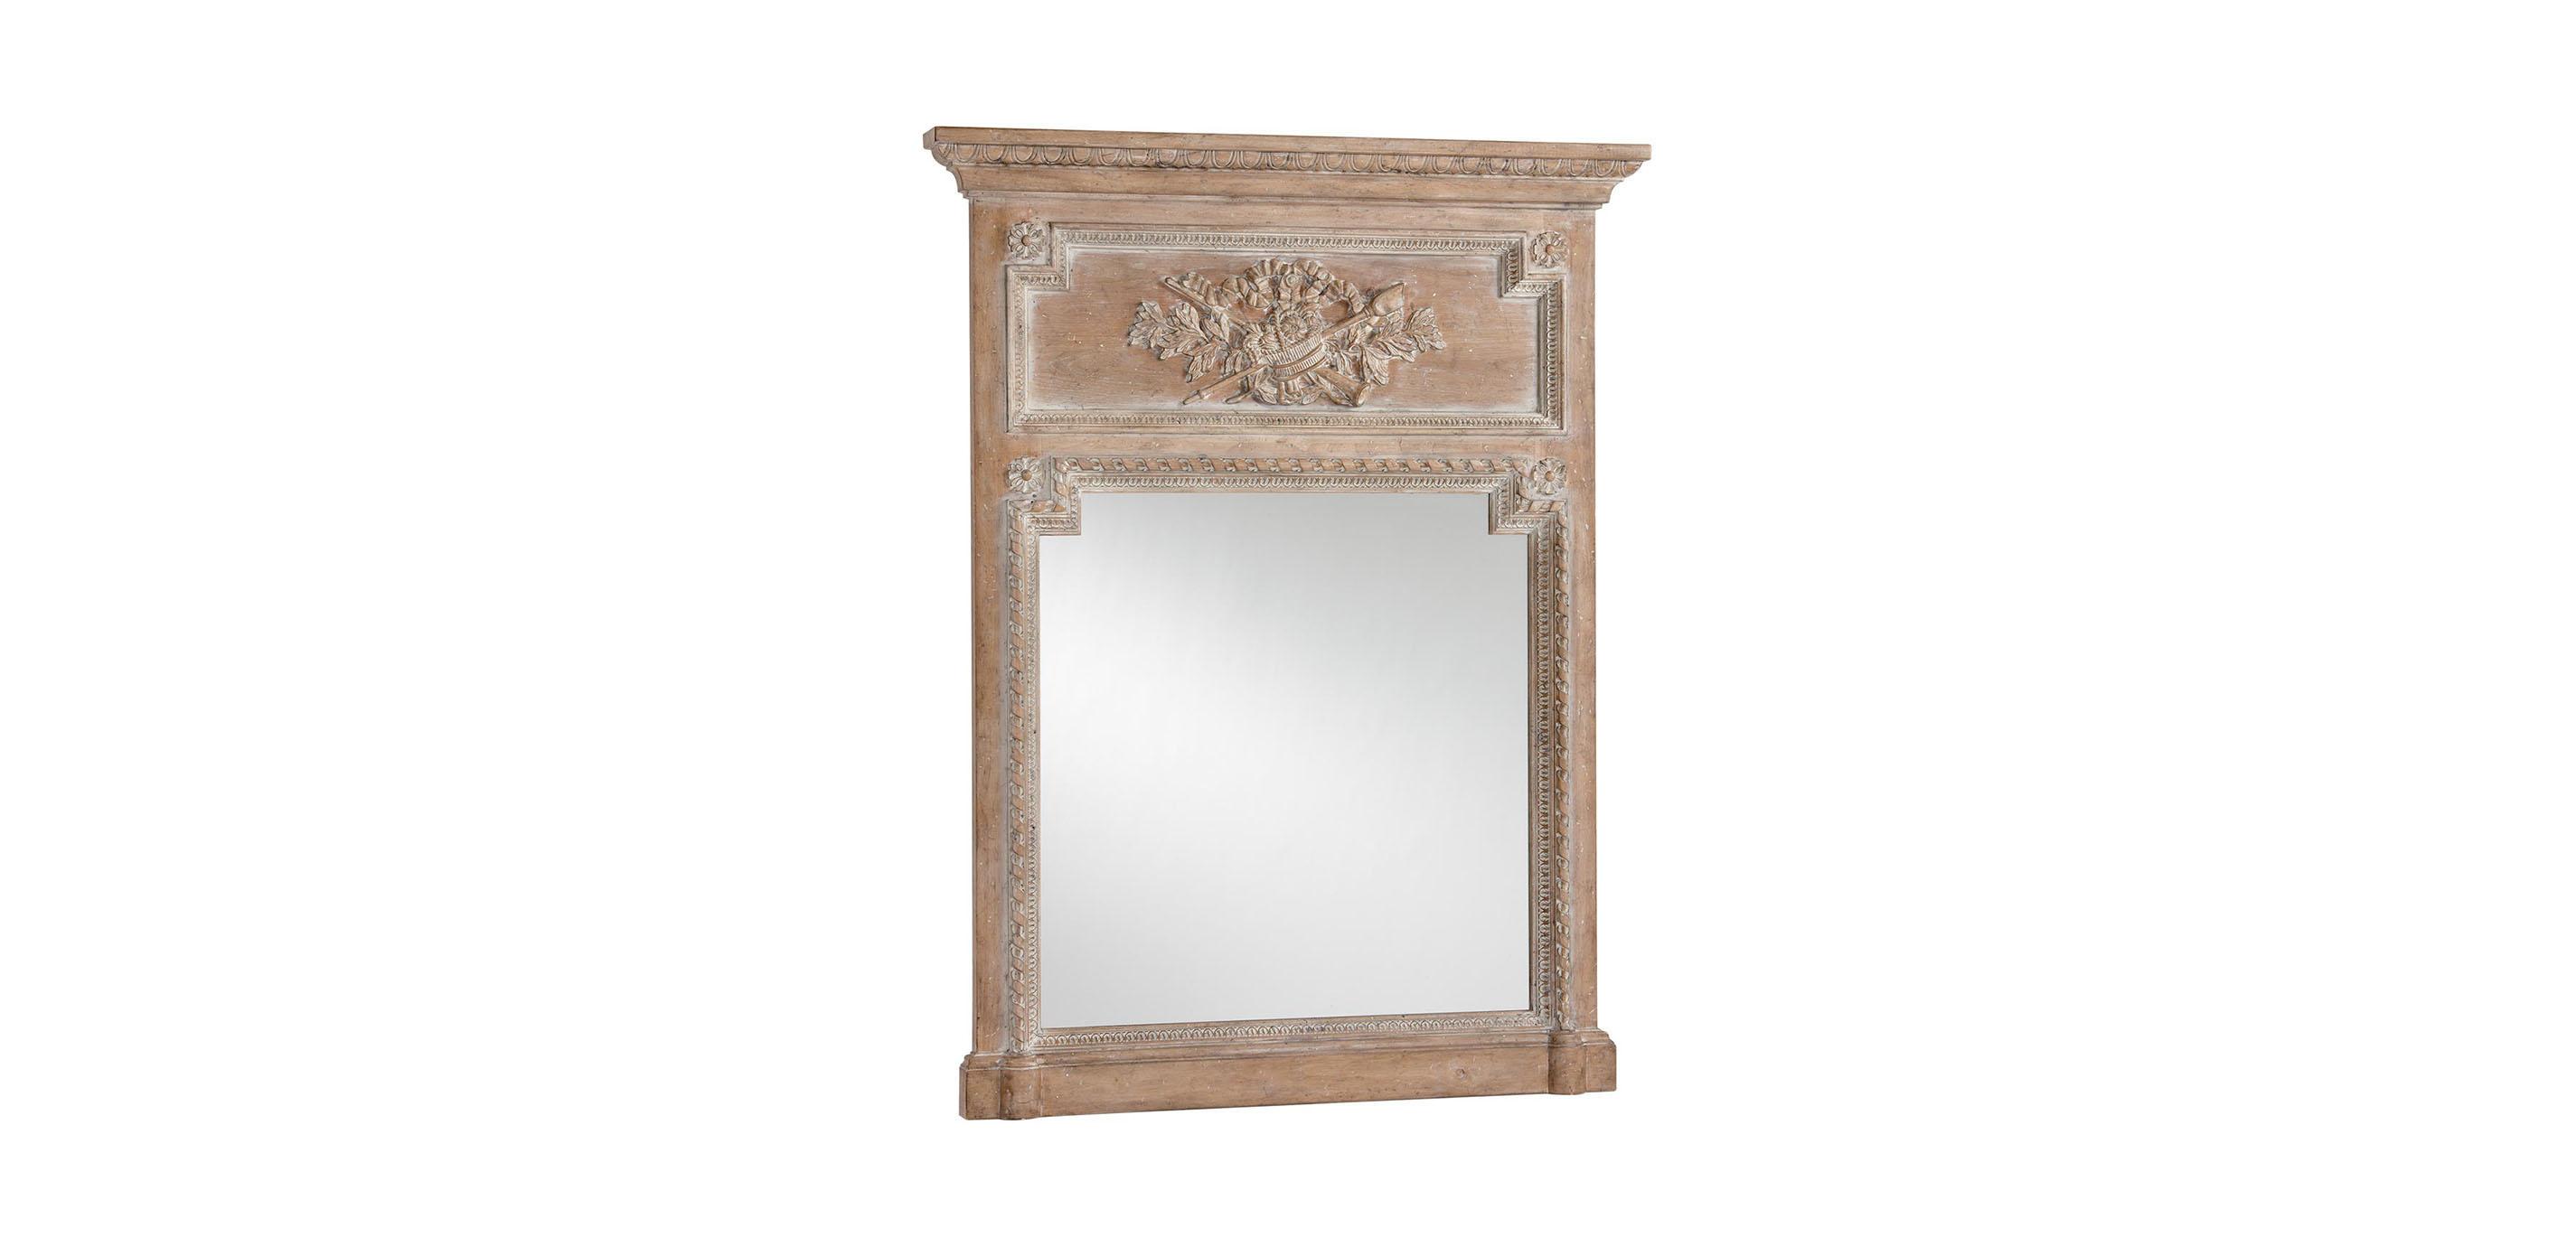 Aged oak madeleine trumeau wall mirror mirrors images aged oak madeleine trumeau wall mirror largegray amipublicfo Images